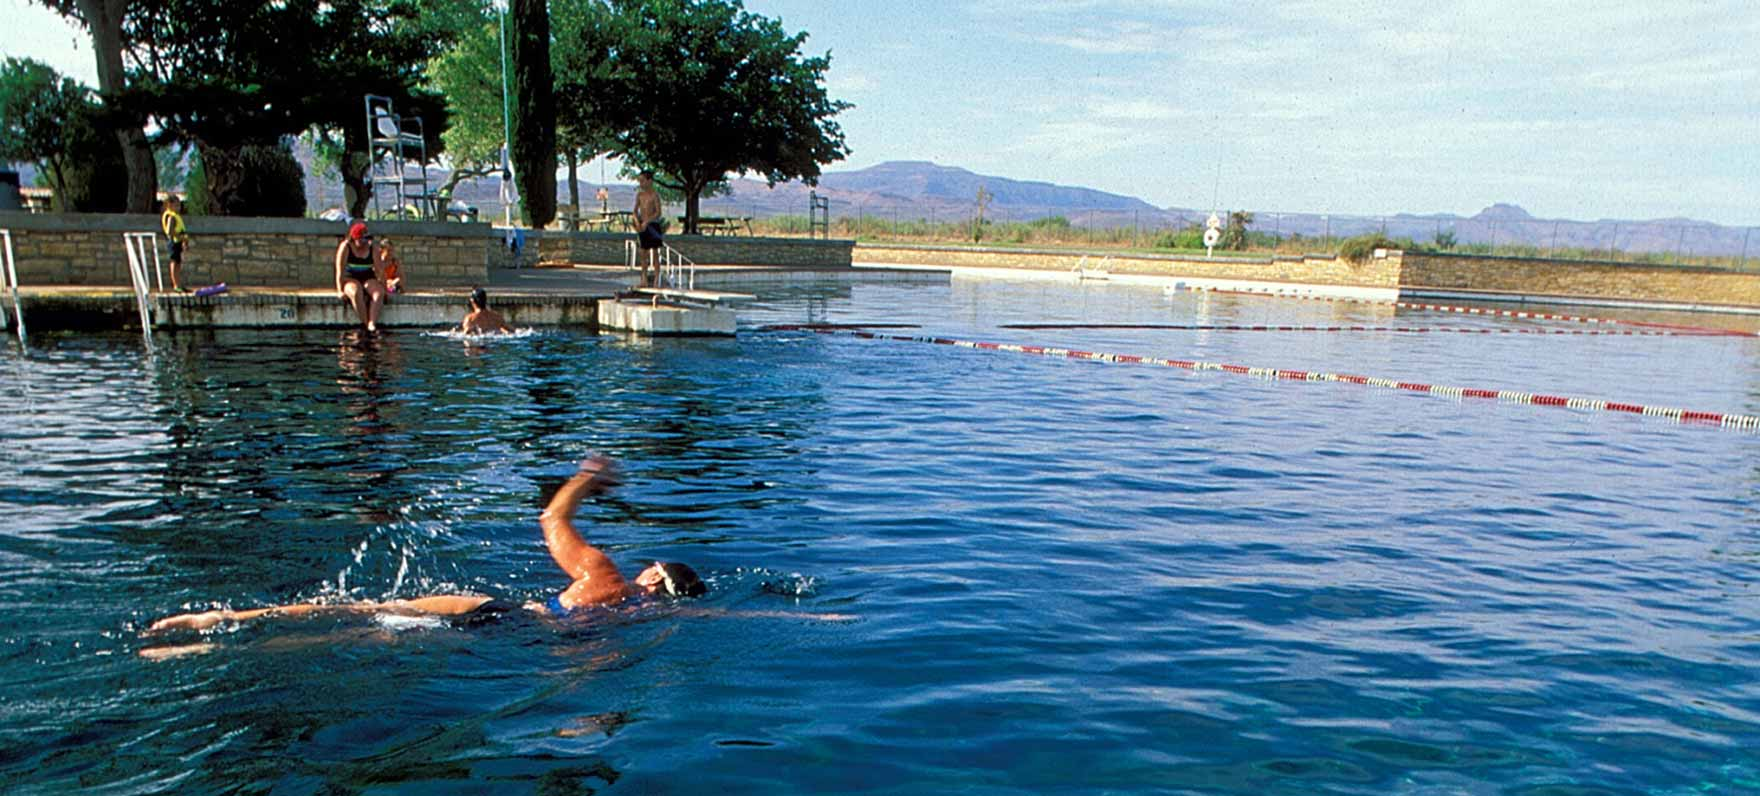 High park swimming pool hours ownw design on vine for Pool design hours